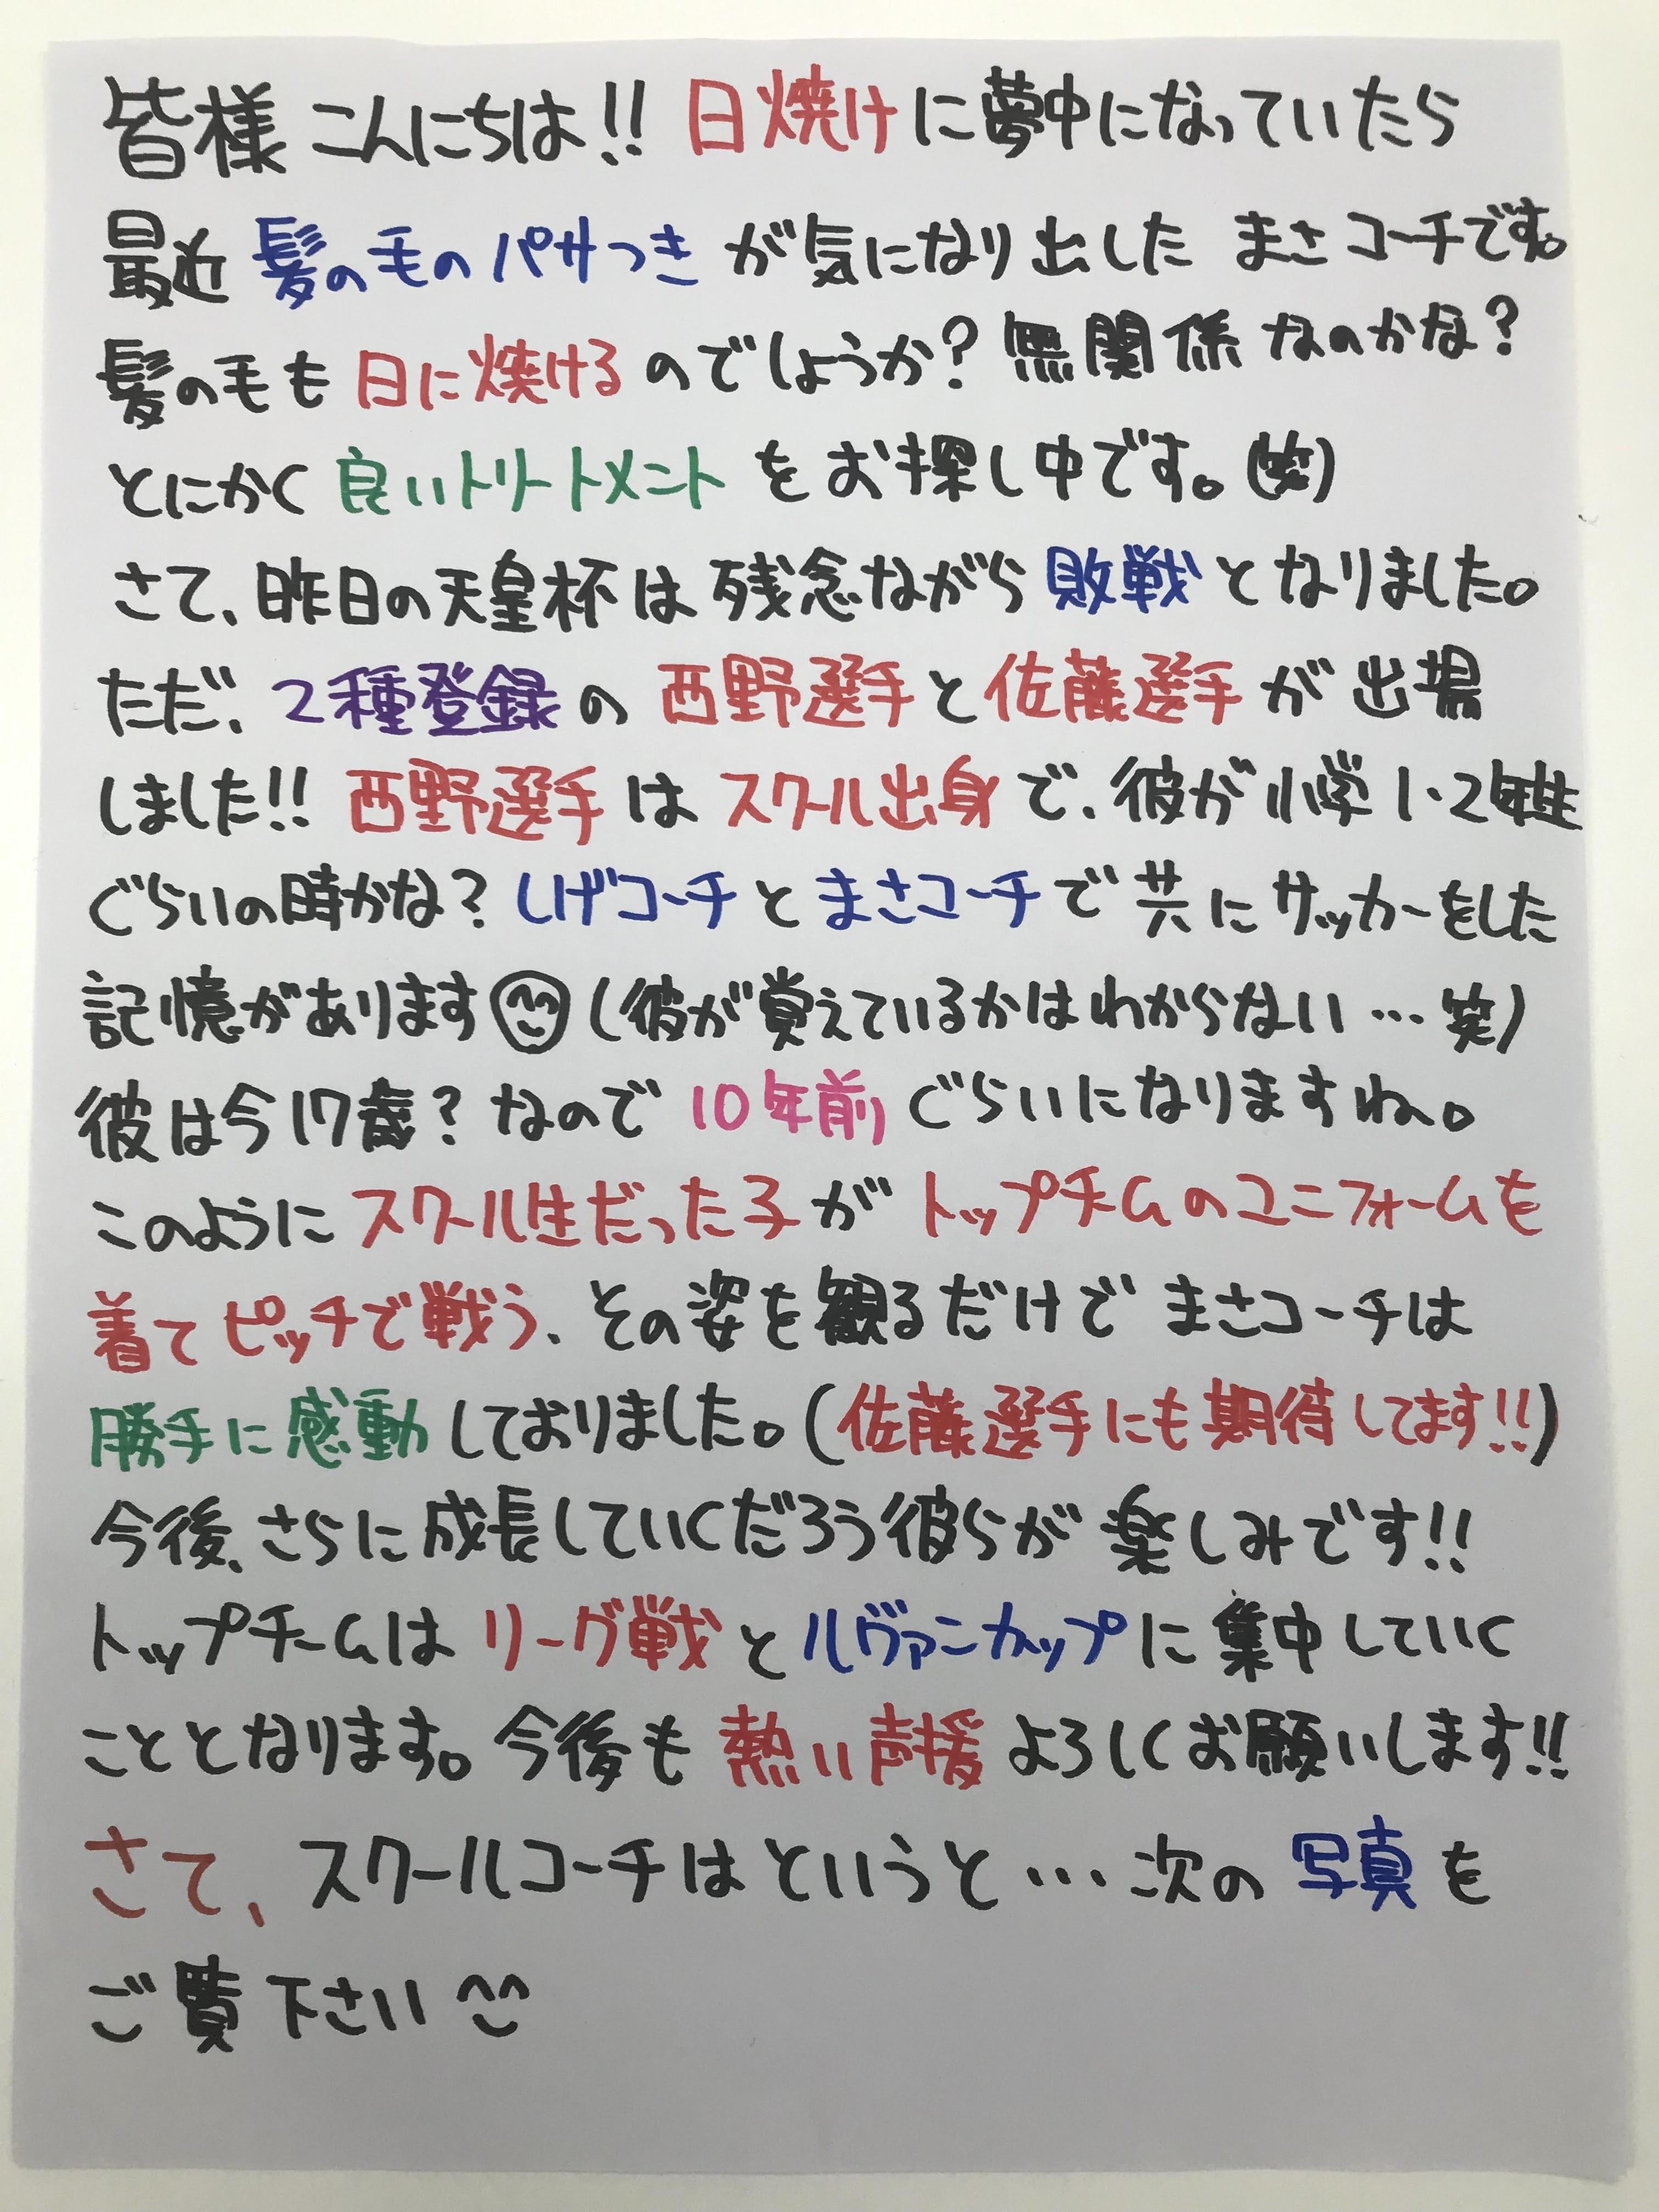 https://chsc.jp/news/up_images/%EF%BC%8320%281%29.jpg